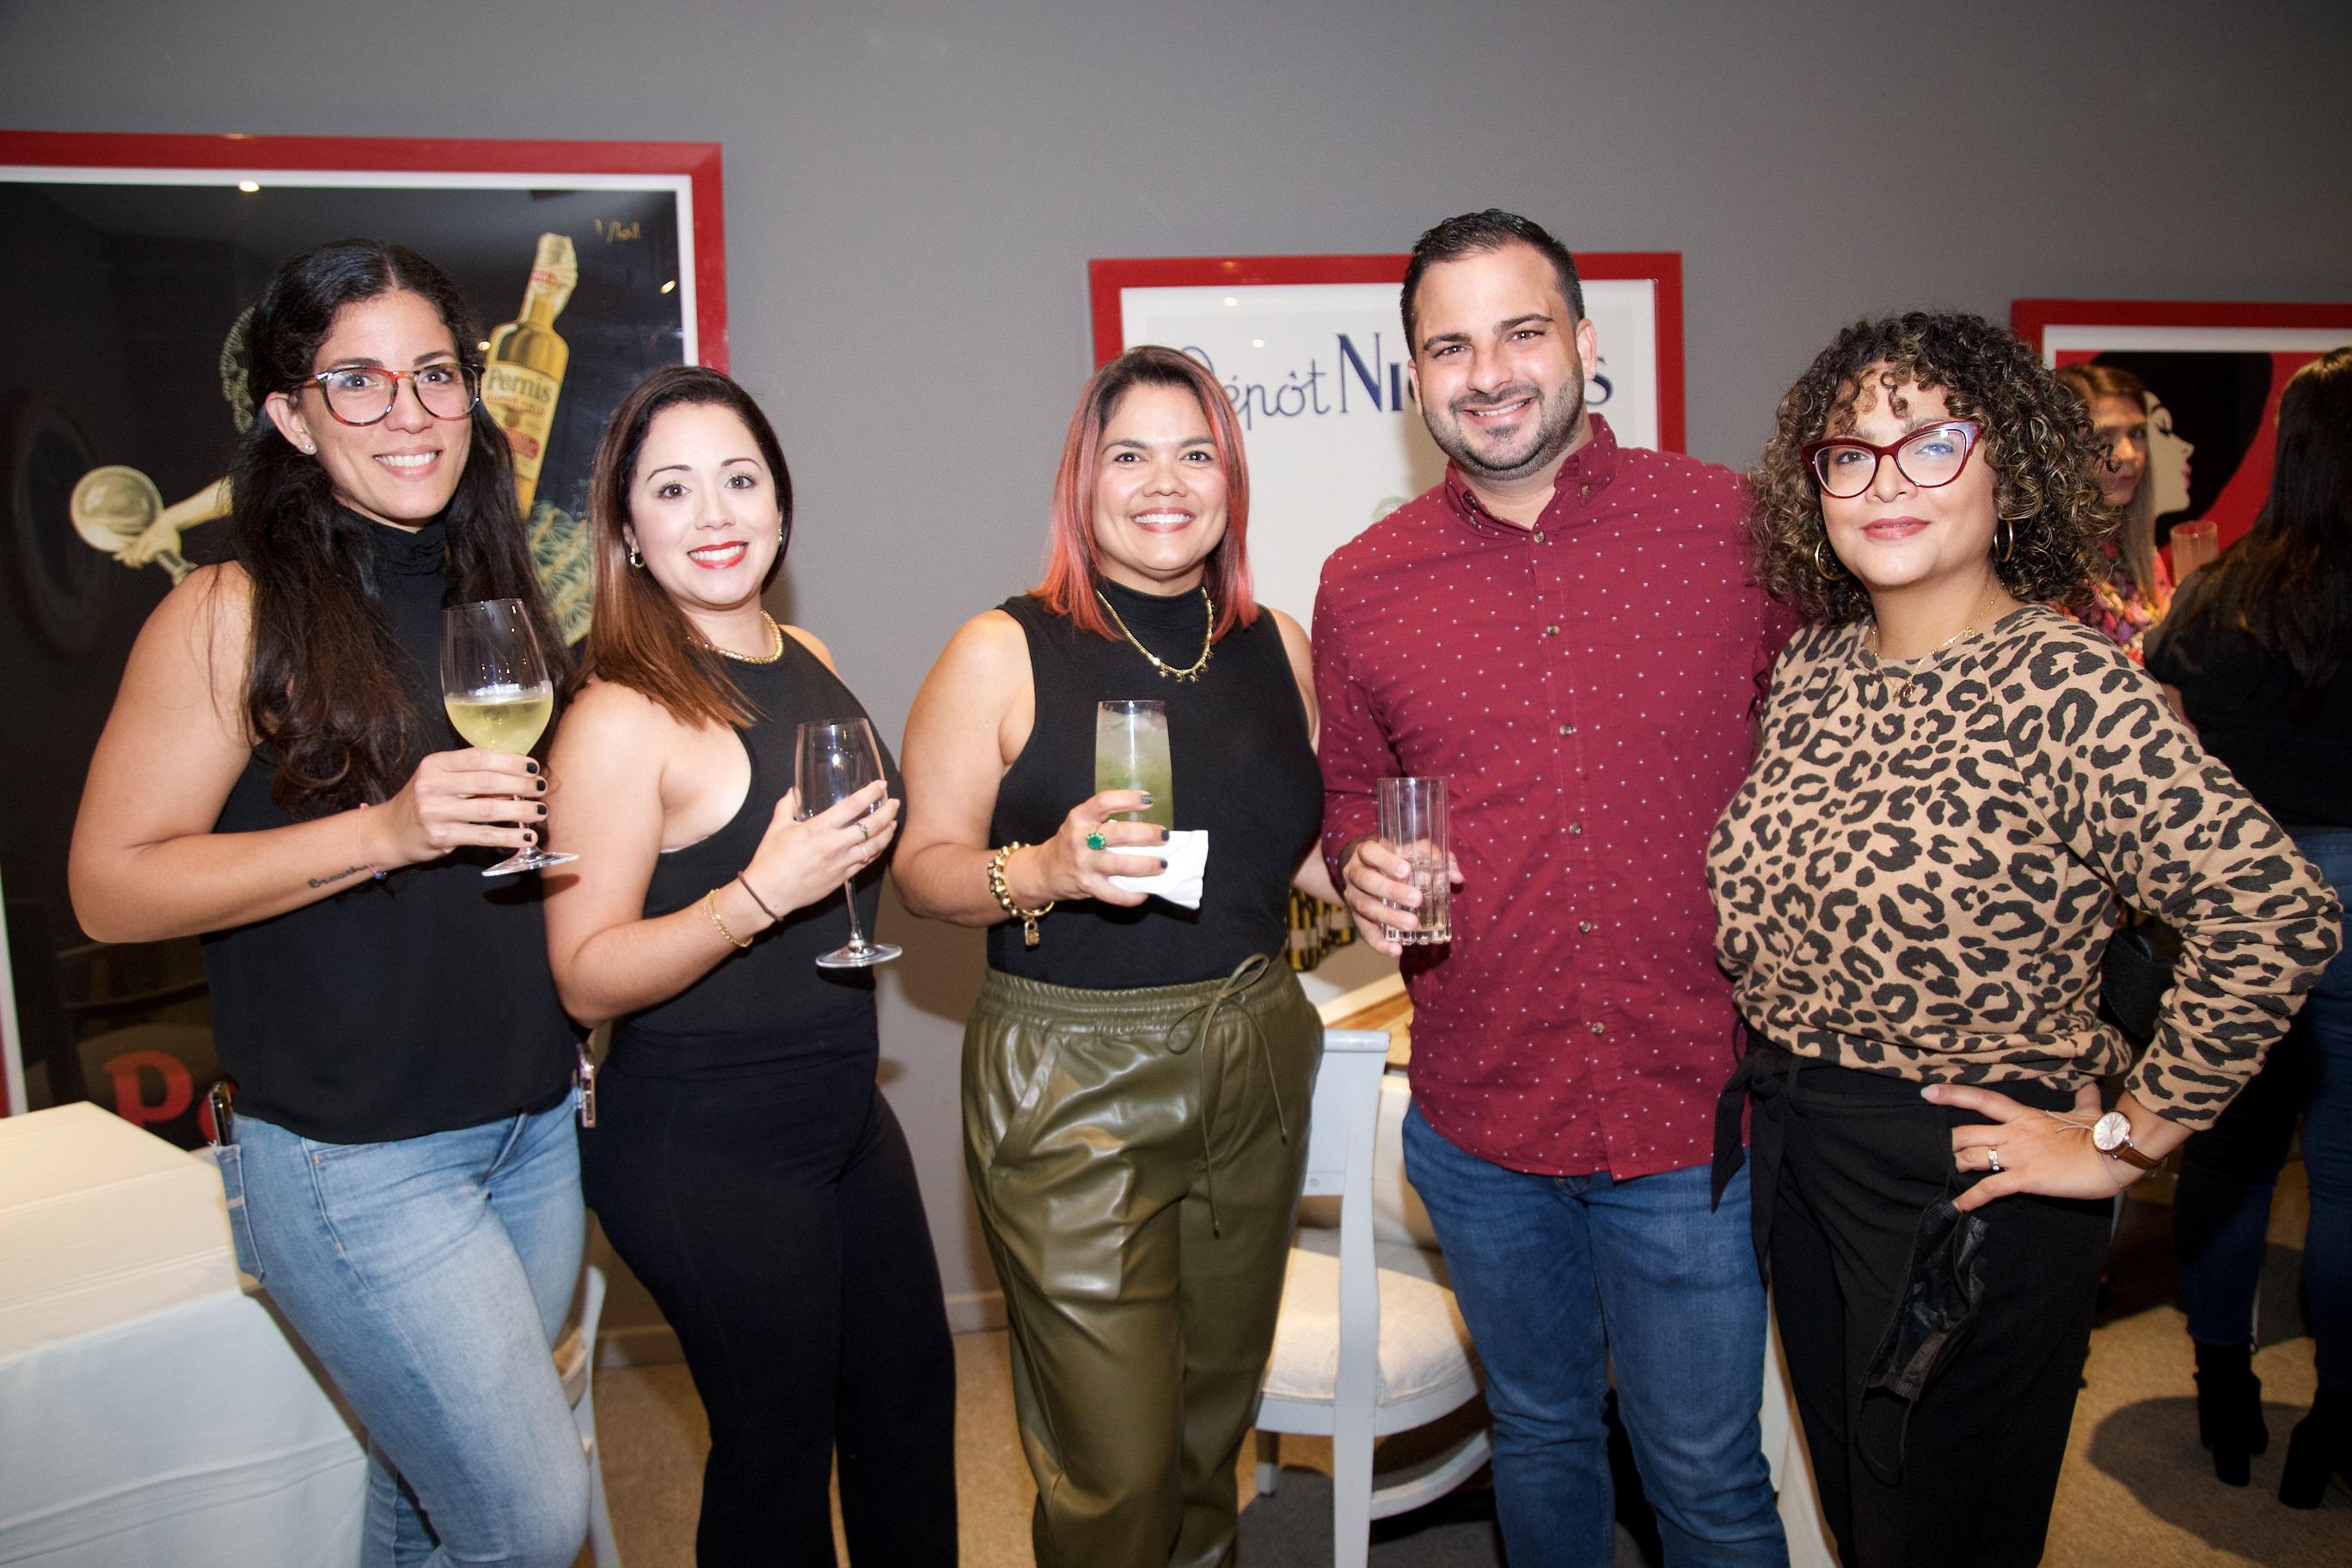 Amanda Agrait, Soé Santiago, Zulma Pérez, Edwin Rodríguez y Mónica Salgado (Nichole Saldarriaga)